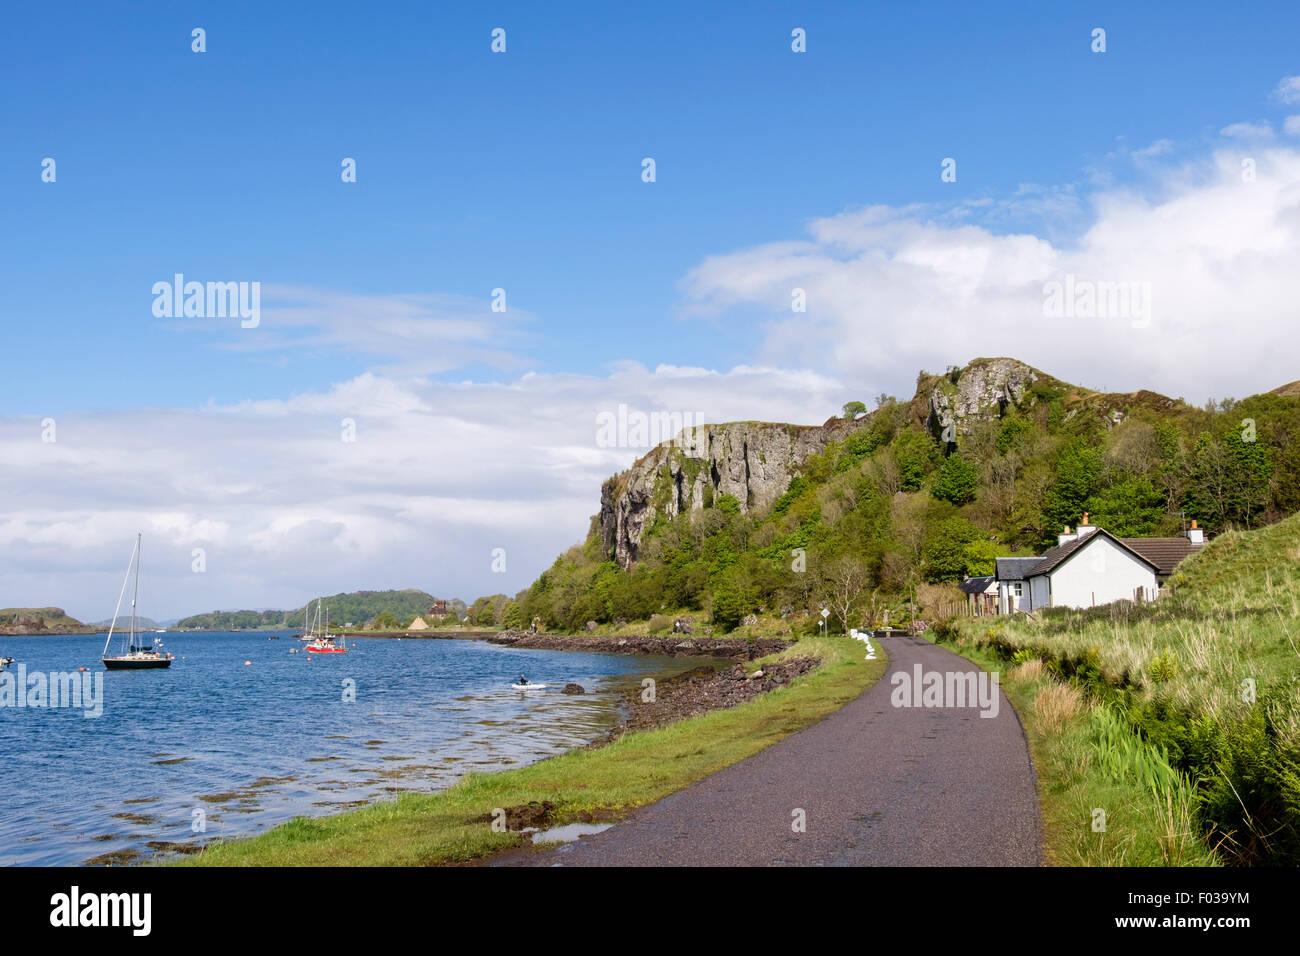 Ardbhan Craigs on coast road from Gallanach beside Sound of Kerrera near Oban, Argyll and Bute, Scotland, UK, Britain - Stock Image